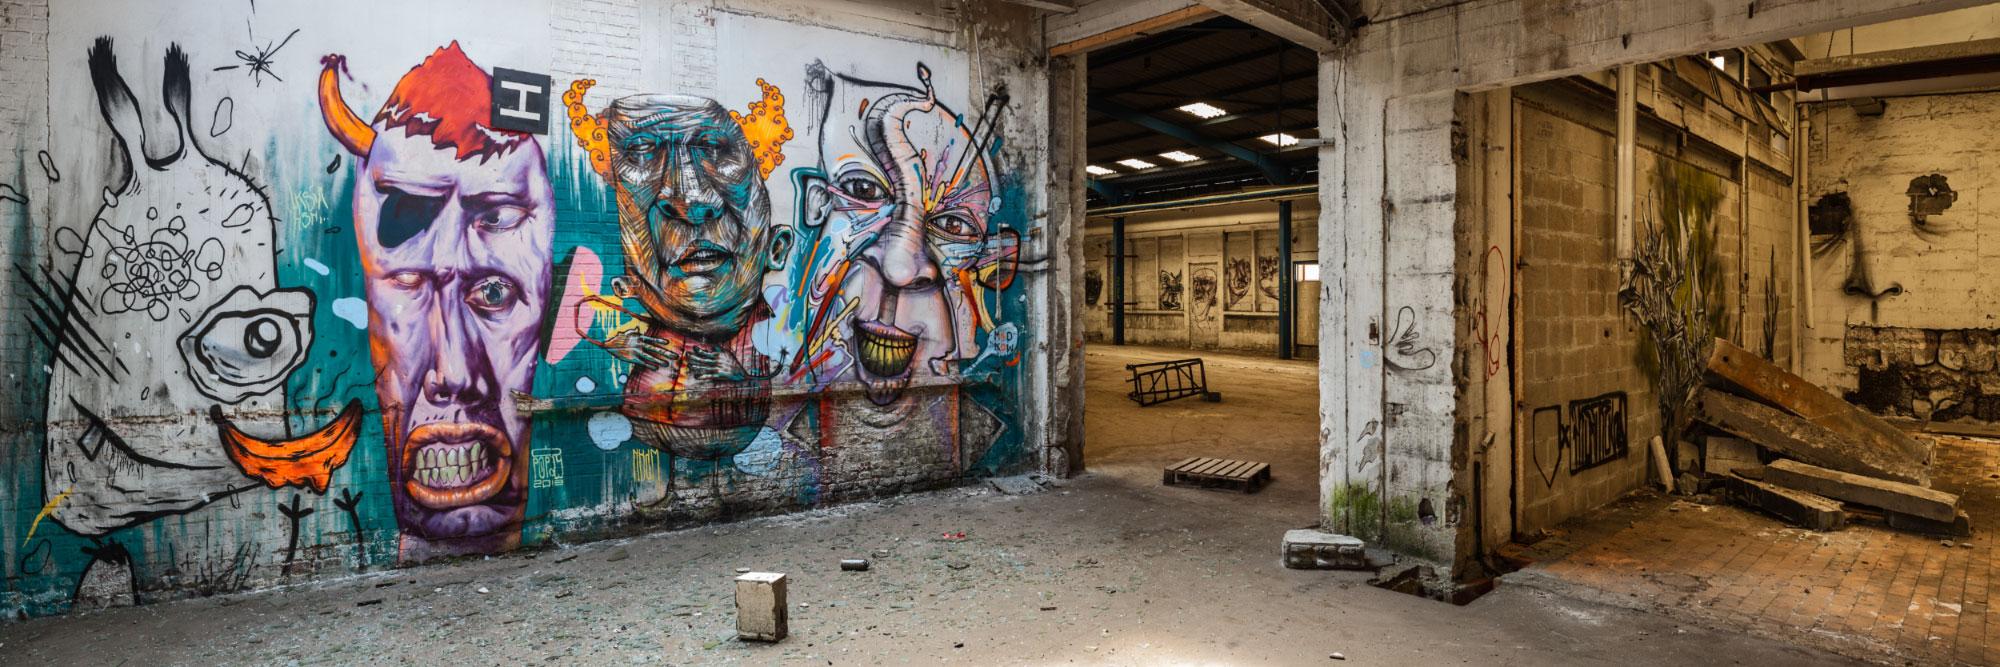 Graff, Saint-Léger-Du-Bourg-Denis / Lksir - Popay - Nikodem - Madcow - Eruko - Ecloz